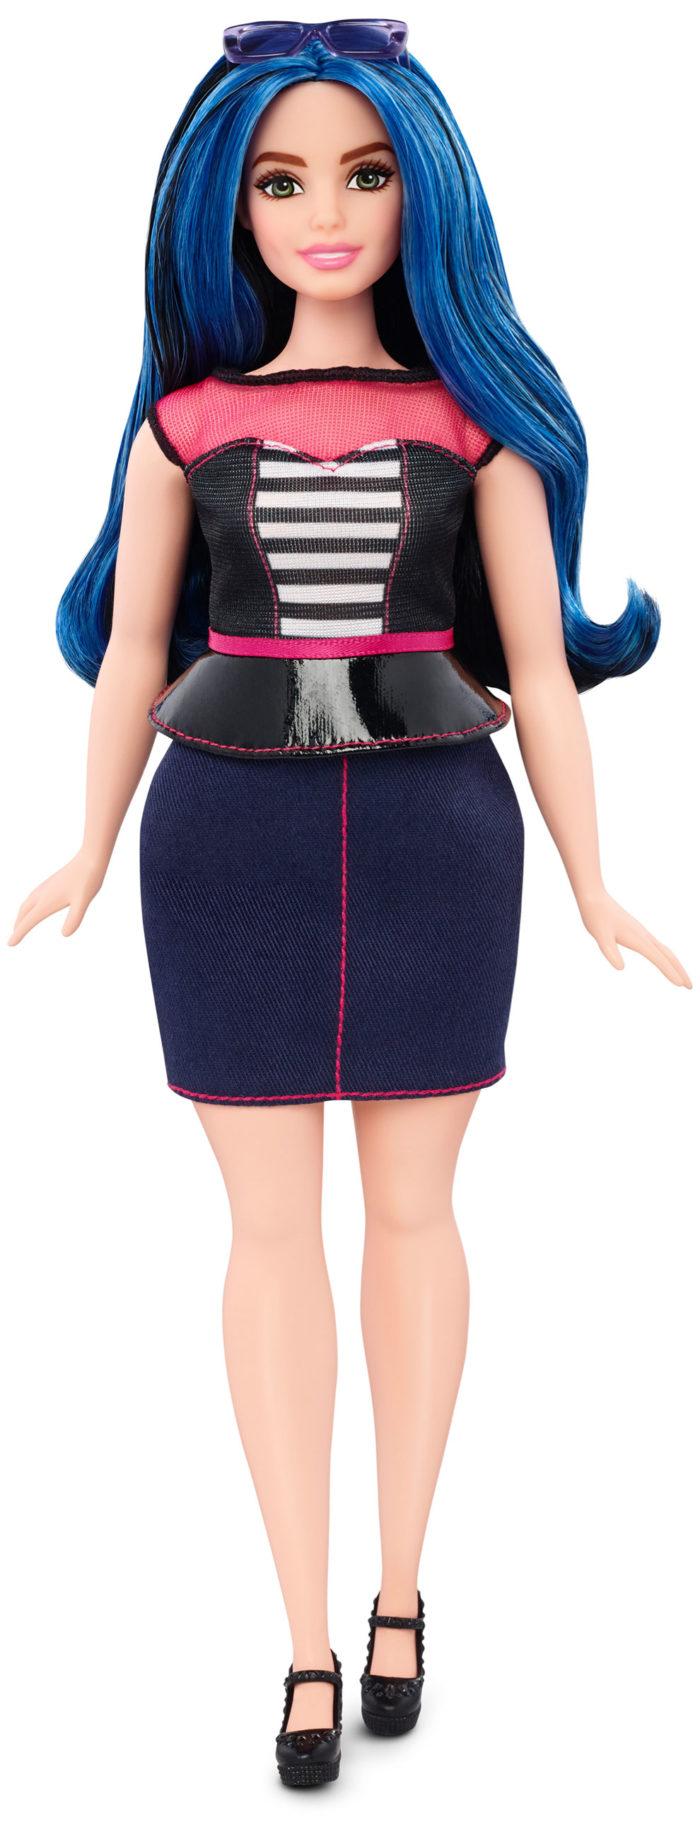 barbie-nuove-curvy-bassa-alta-realistica-07